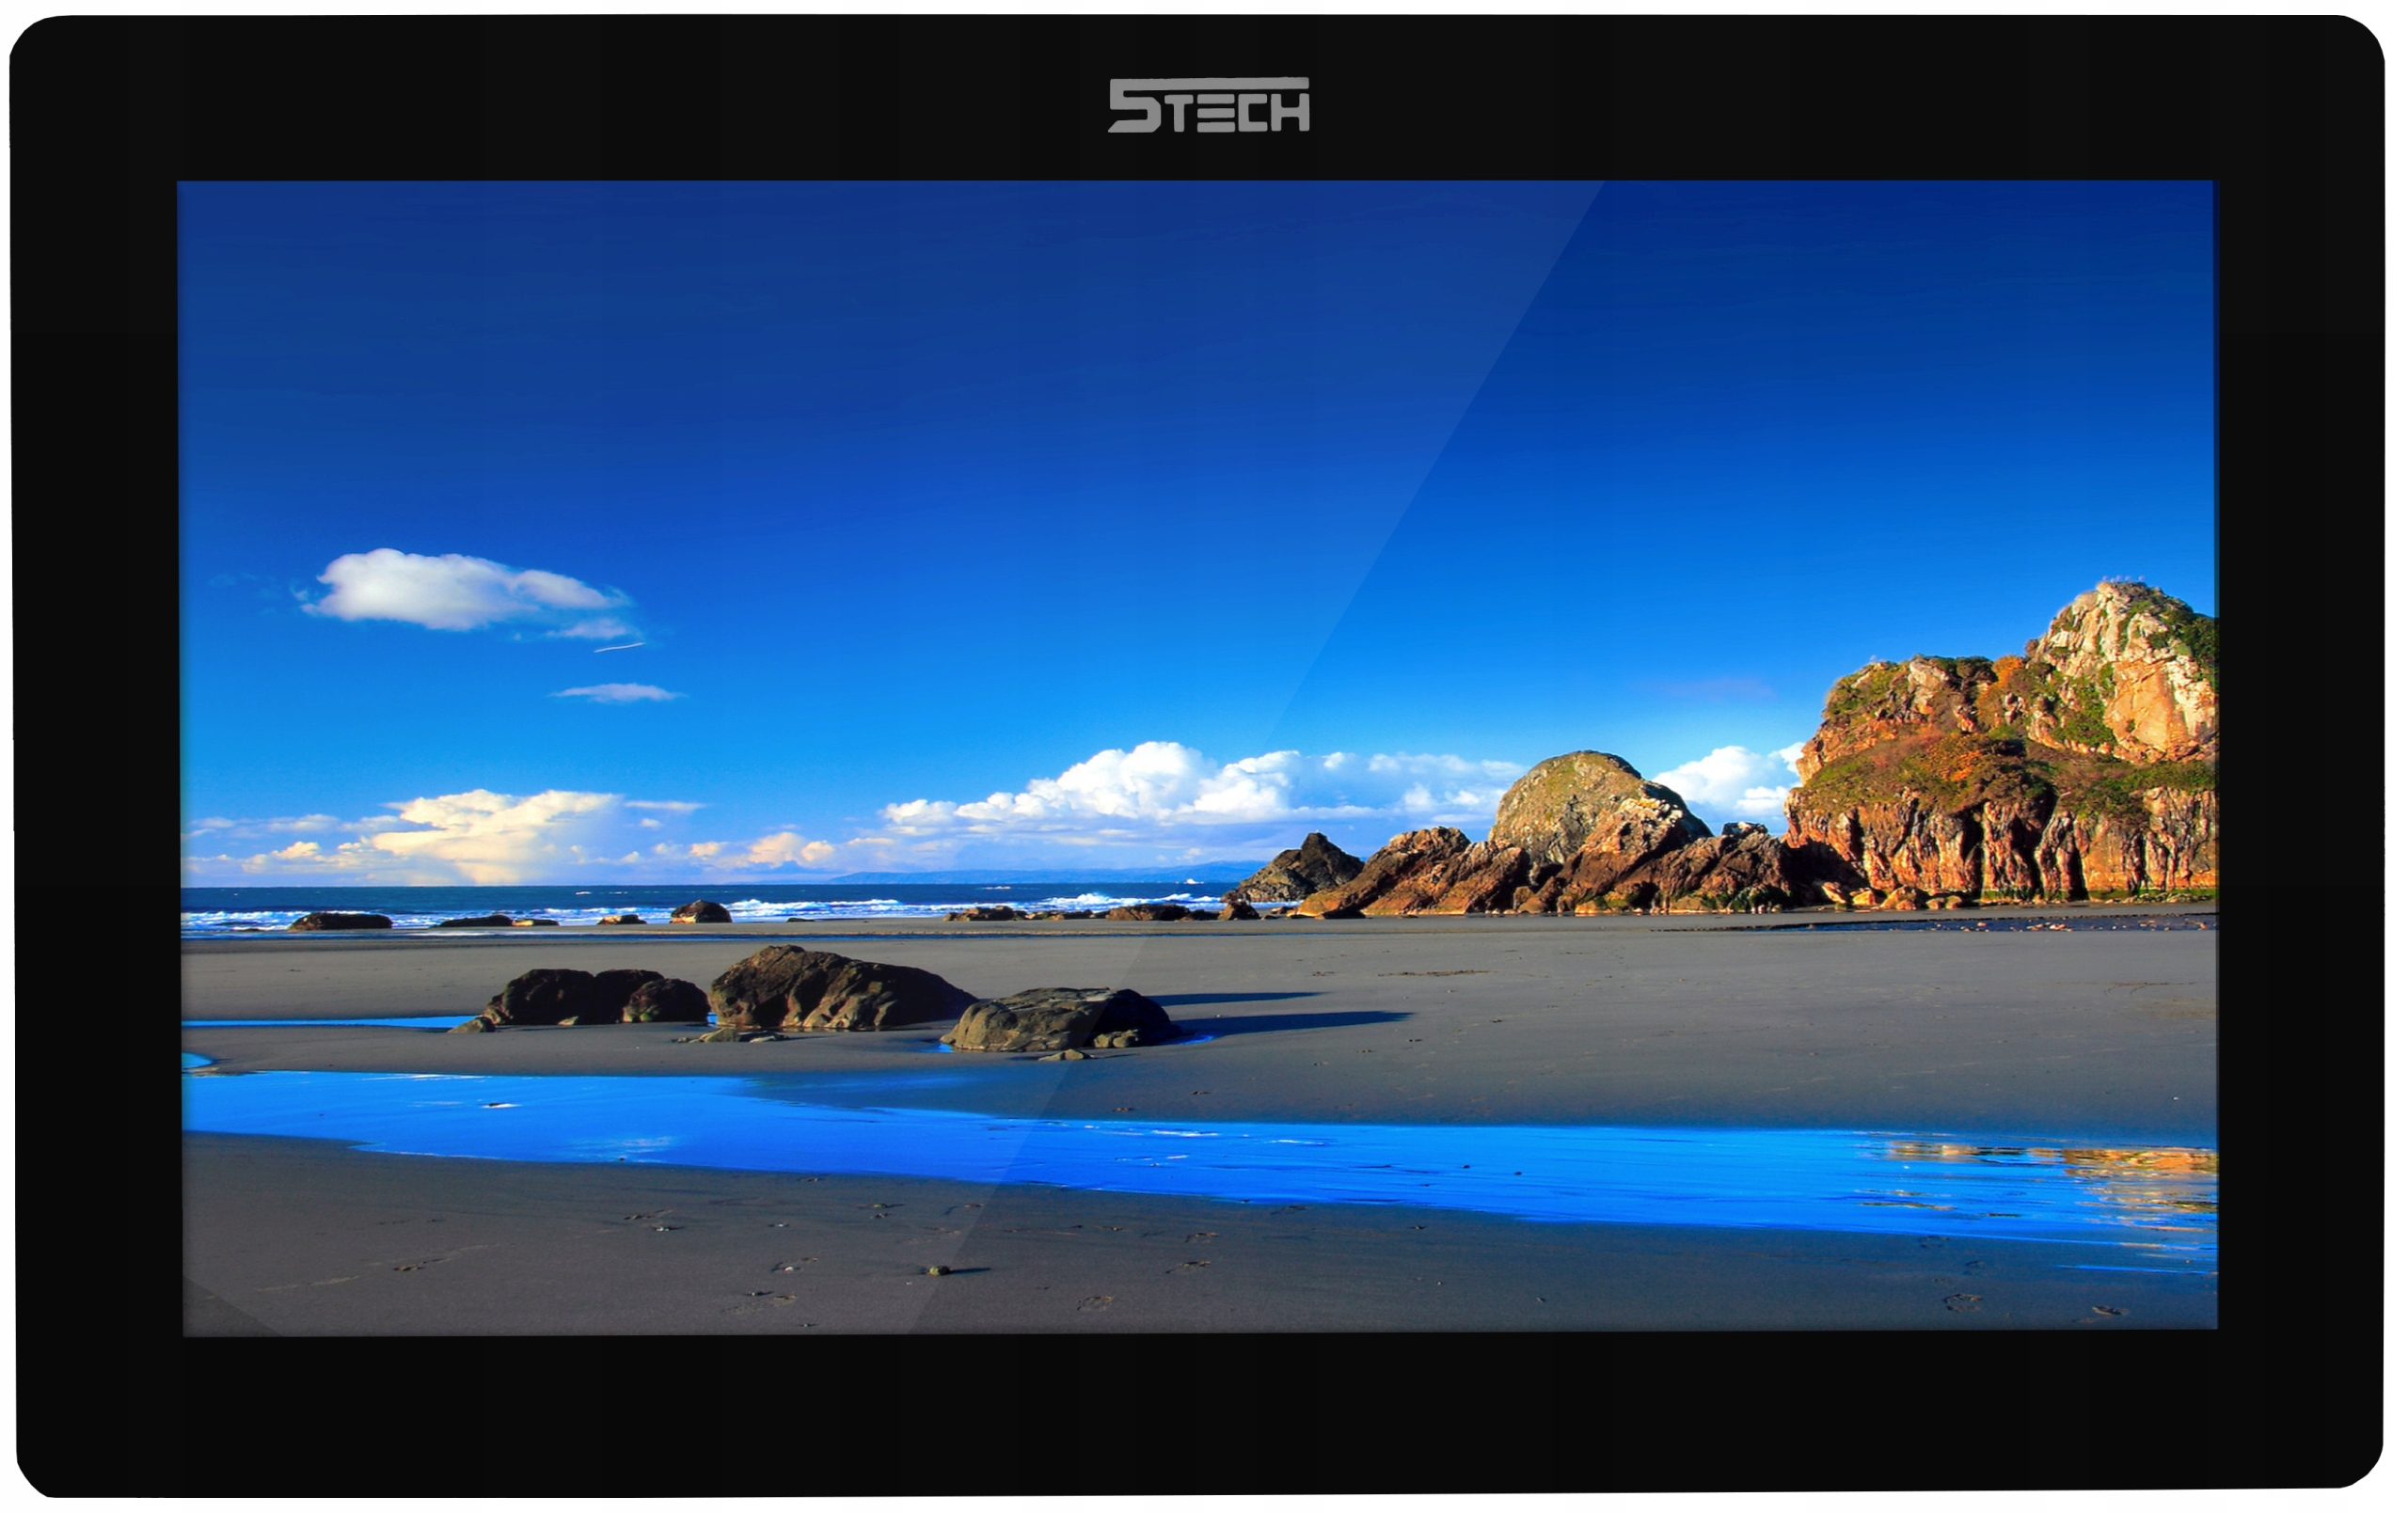 Wideodomofon Videodomofon WiFi FHD 5TECH TELEFON Kolor Czarny